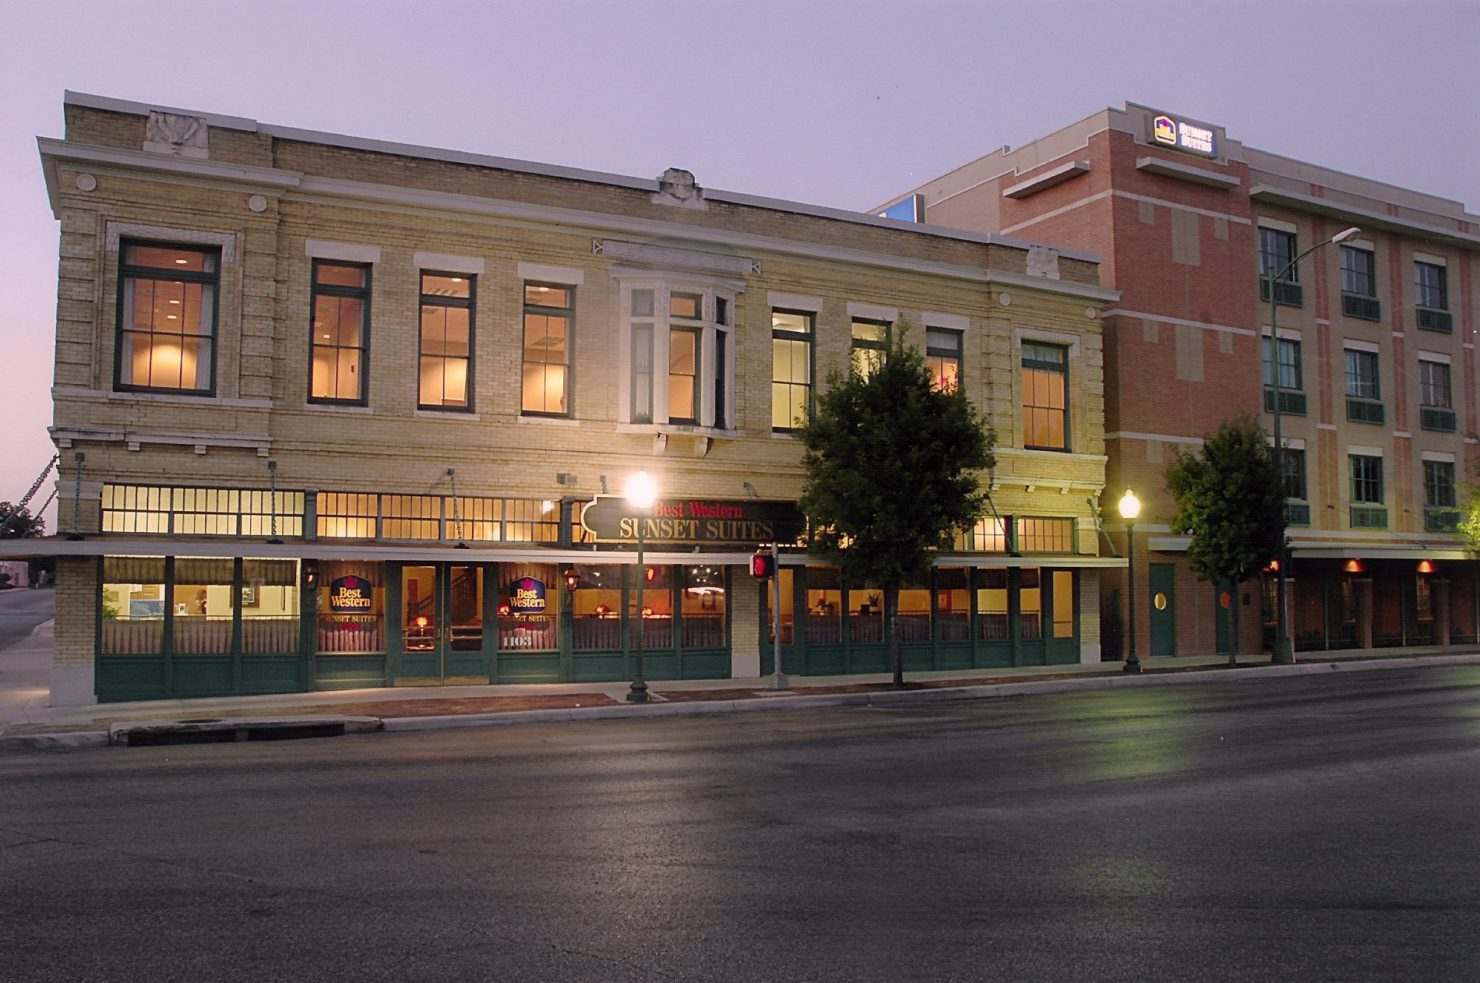 Icke Building, 1880. St. Paul Square Historic District, San Antonio, Texas, Best Western Suites